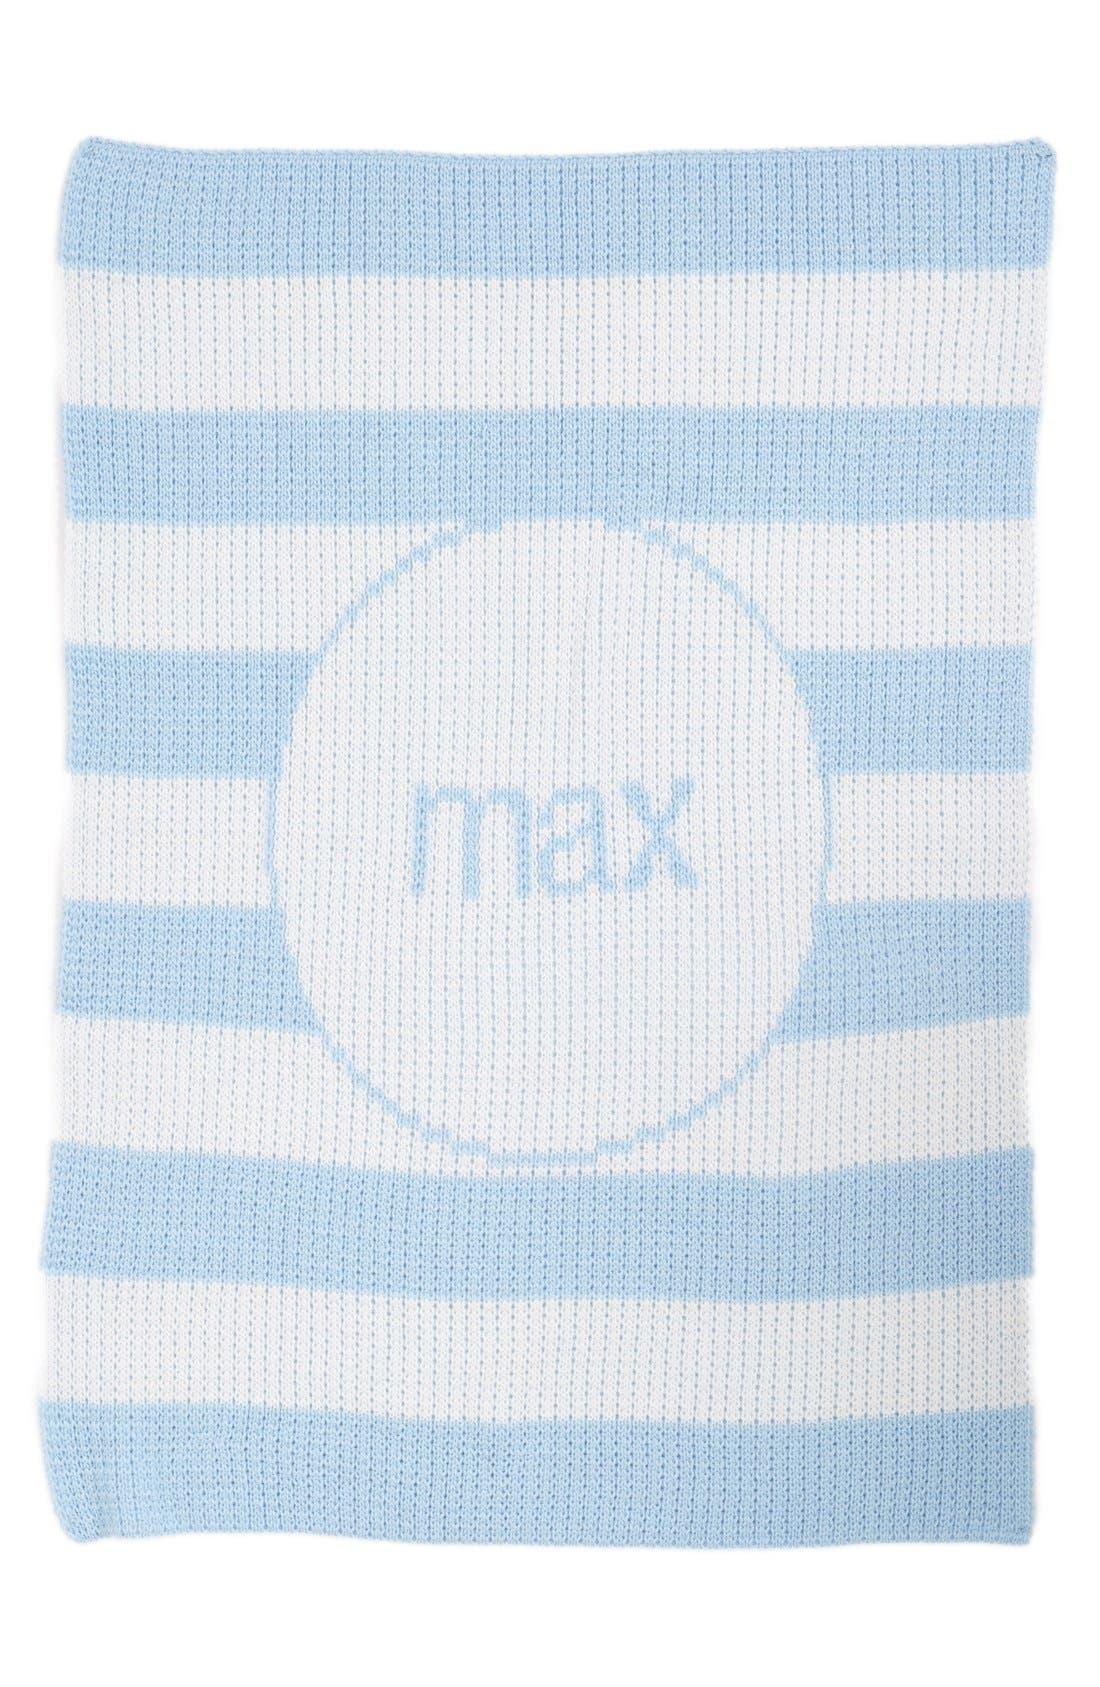 'Modern Stripe' Personalized Stroller Blanket,                         Main,                         color, White/ Pale Blue